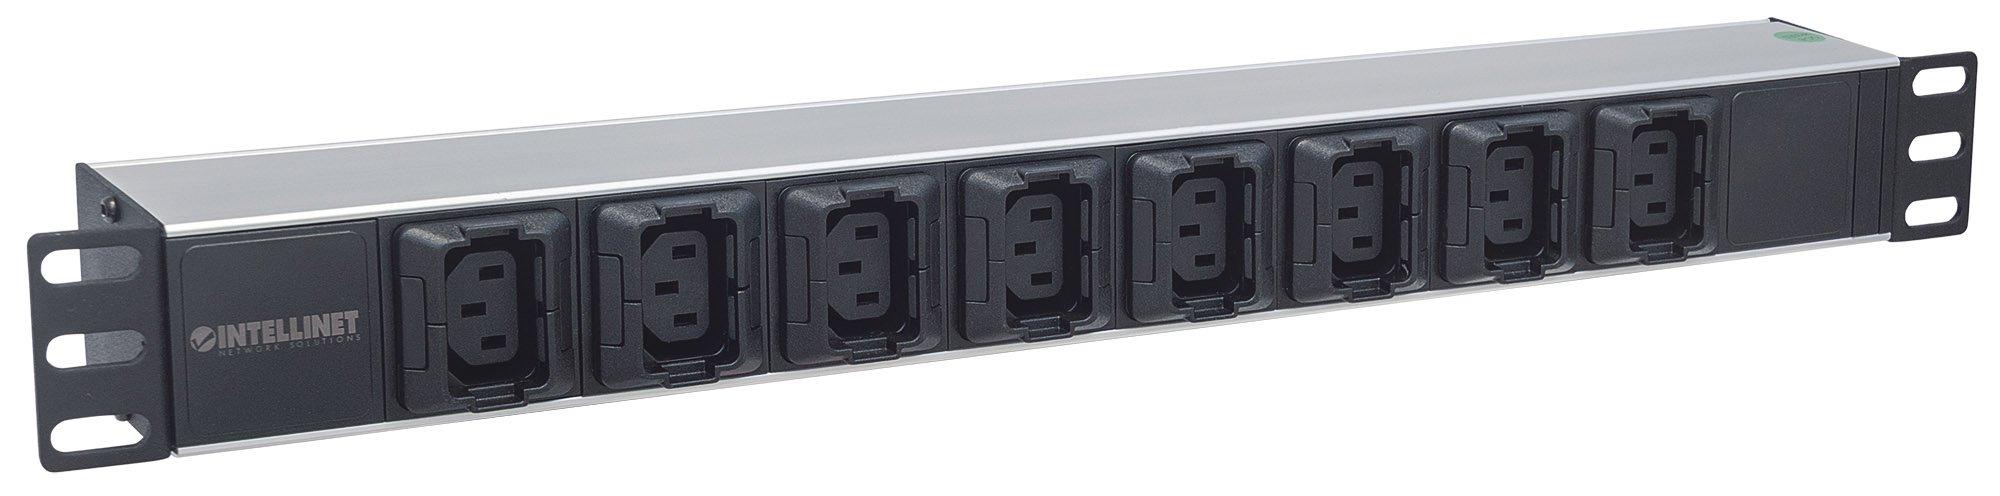 Intellinet 19'' 1U Rackmount Anti-Shedding 8-Output C13 Power Distribution Unit (PDU) by Intellinet (Image #2)